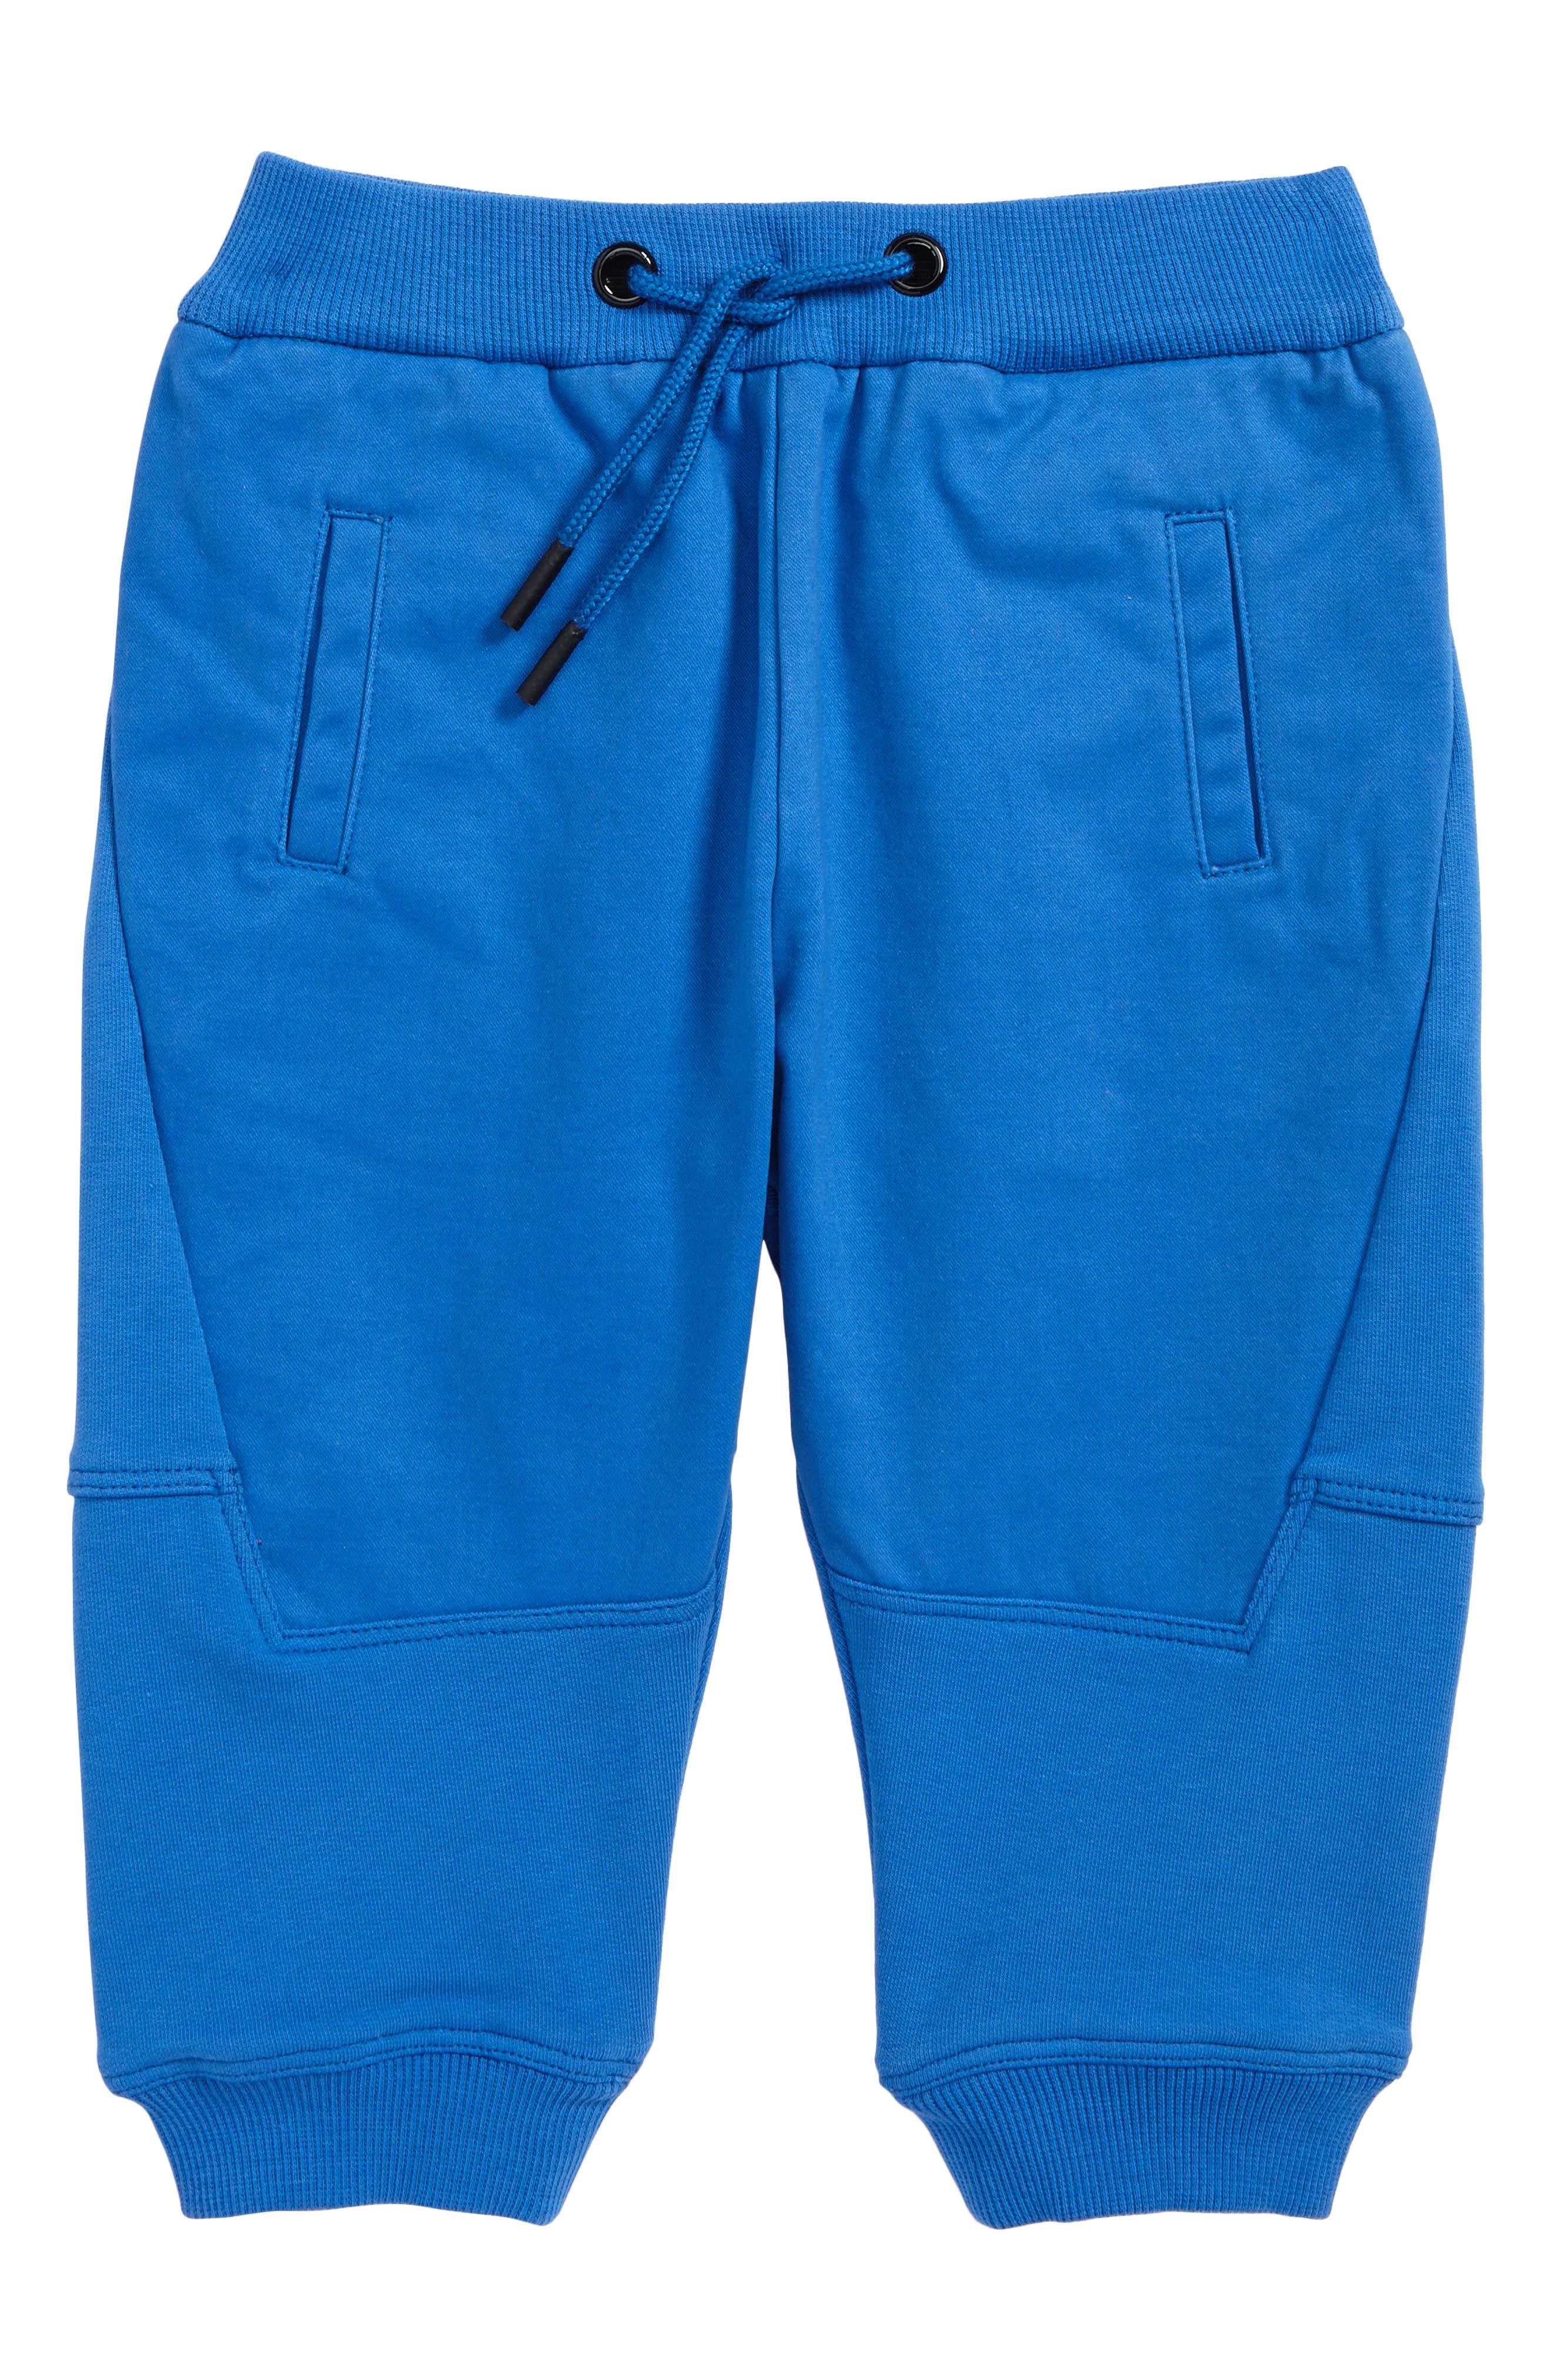 Jogger Pants,                         Main,                         color, 434